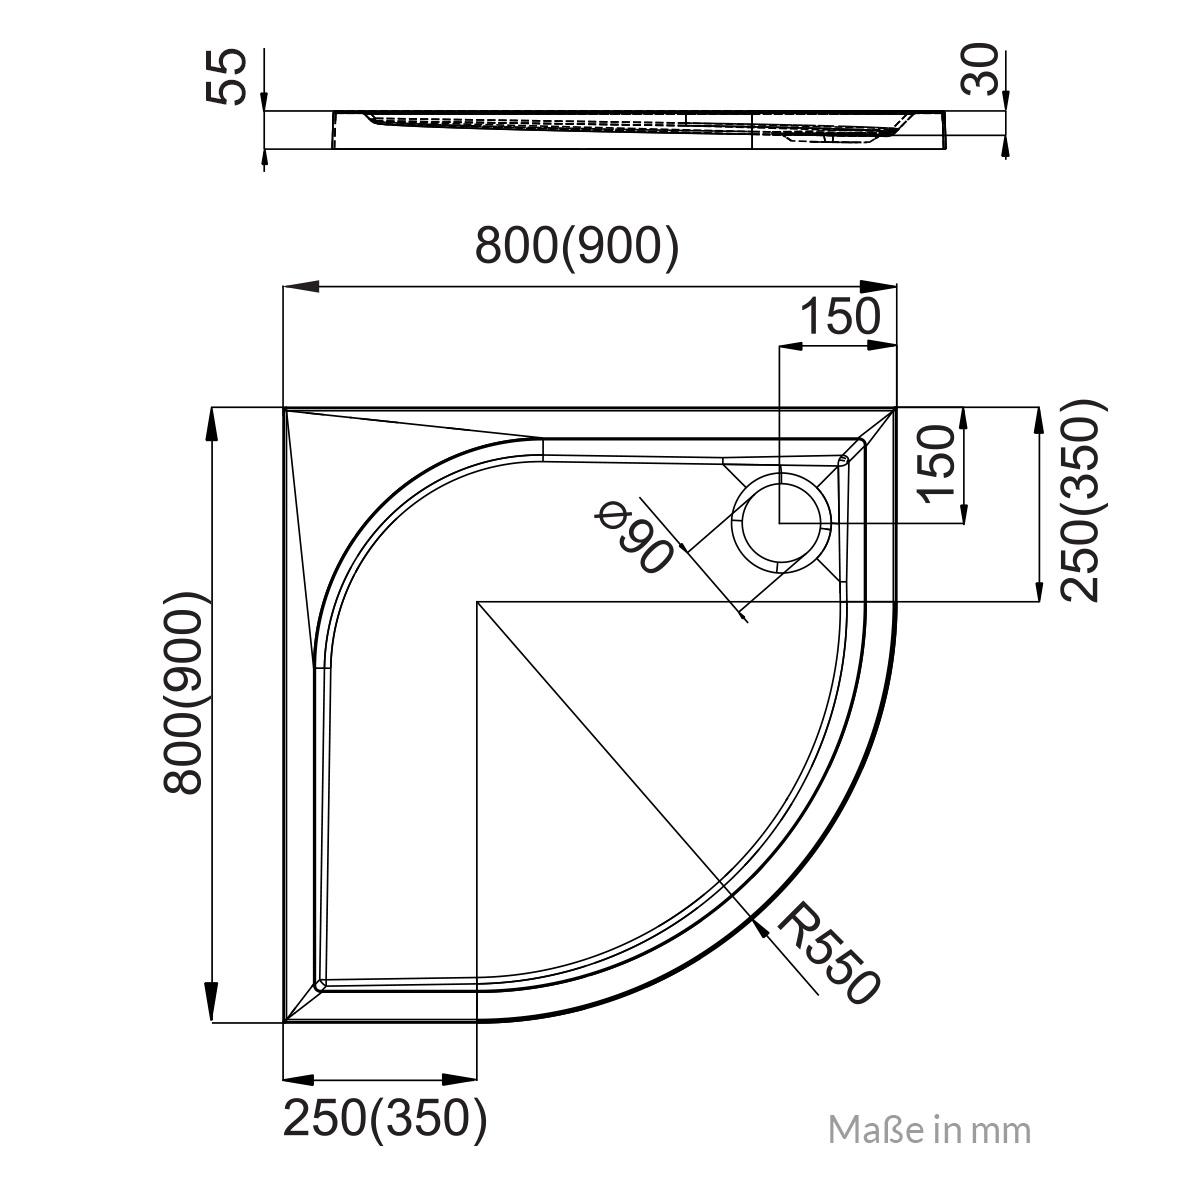 duschwanne viertelkreis aquabad 80 90 cm. Black Bedroom Furniture Sets. Home Design Ideas